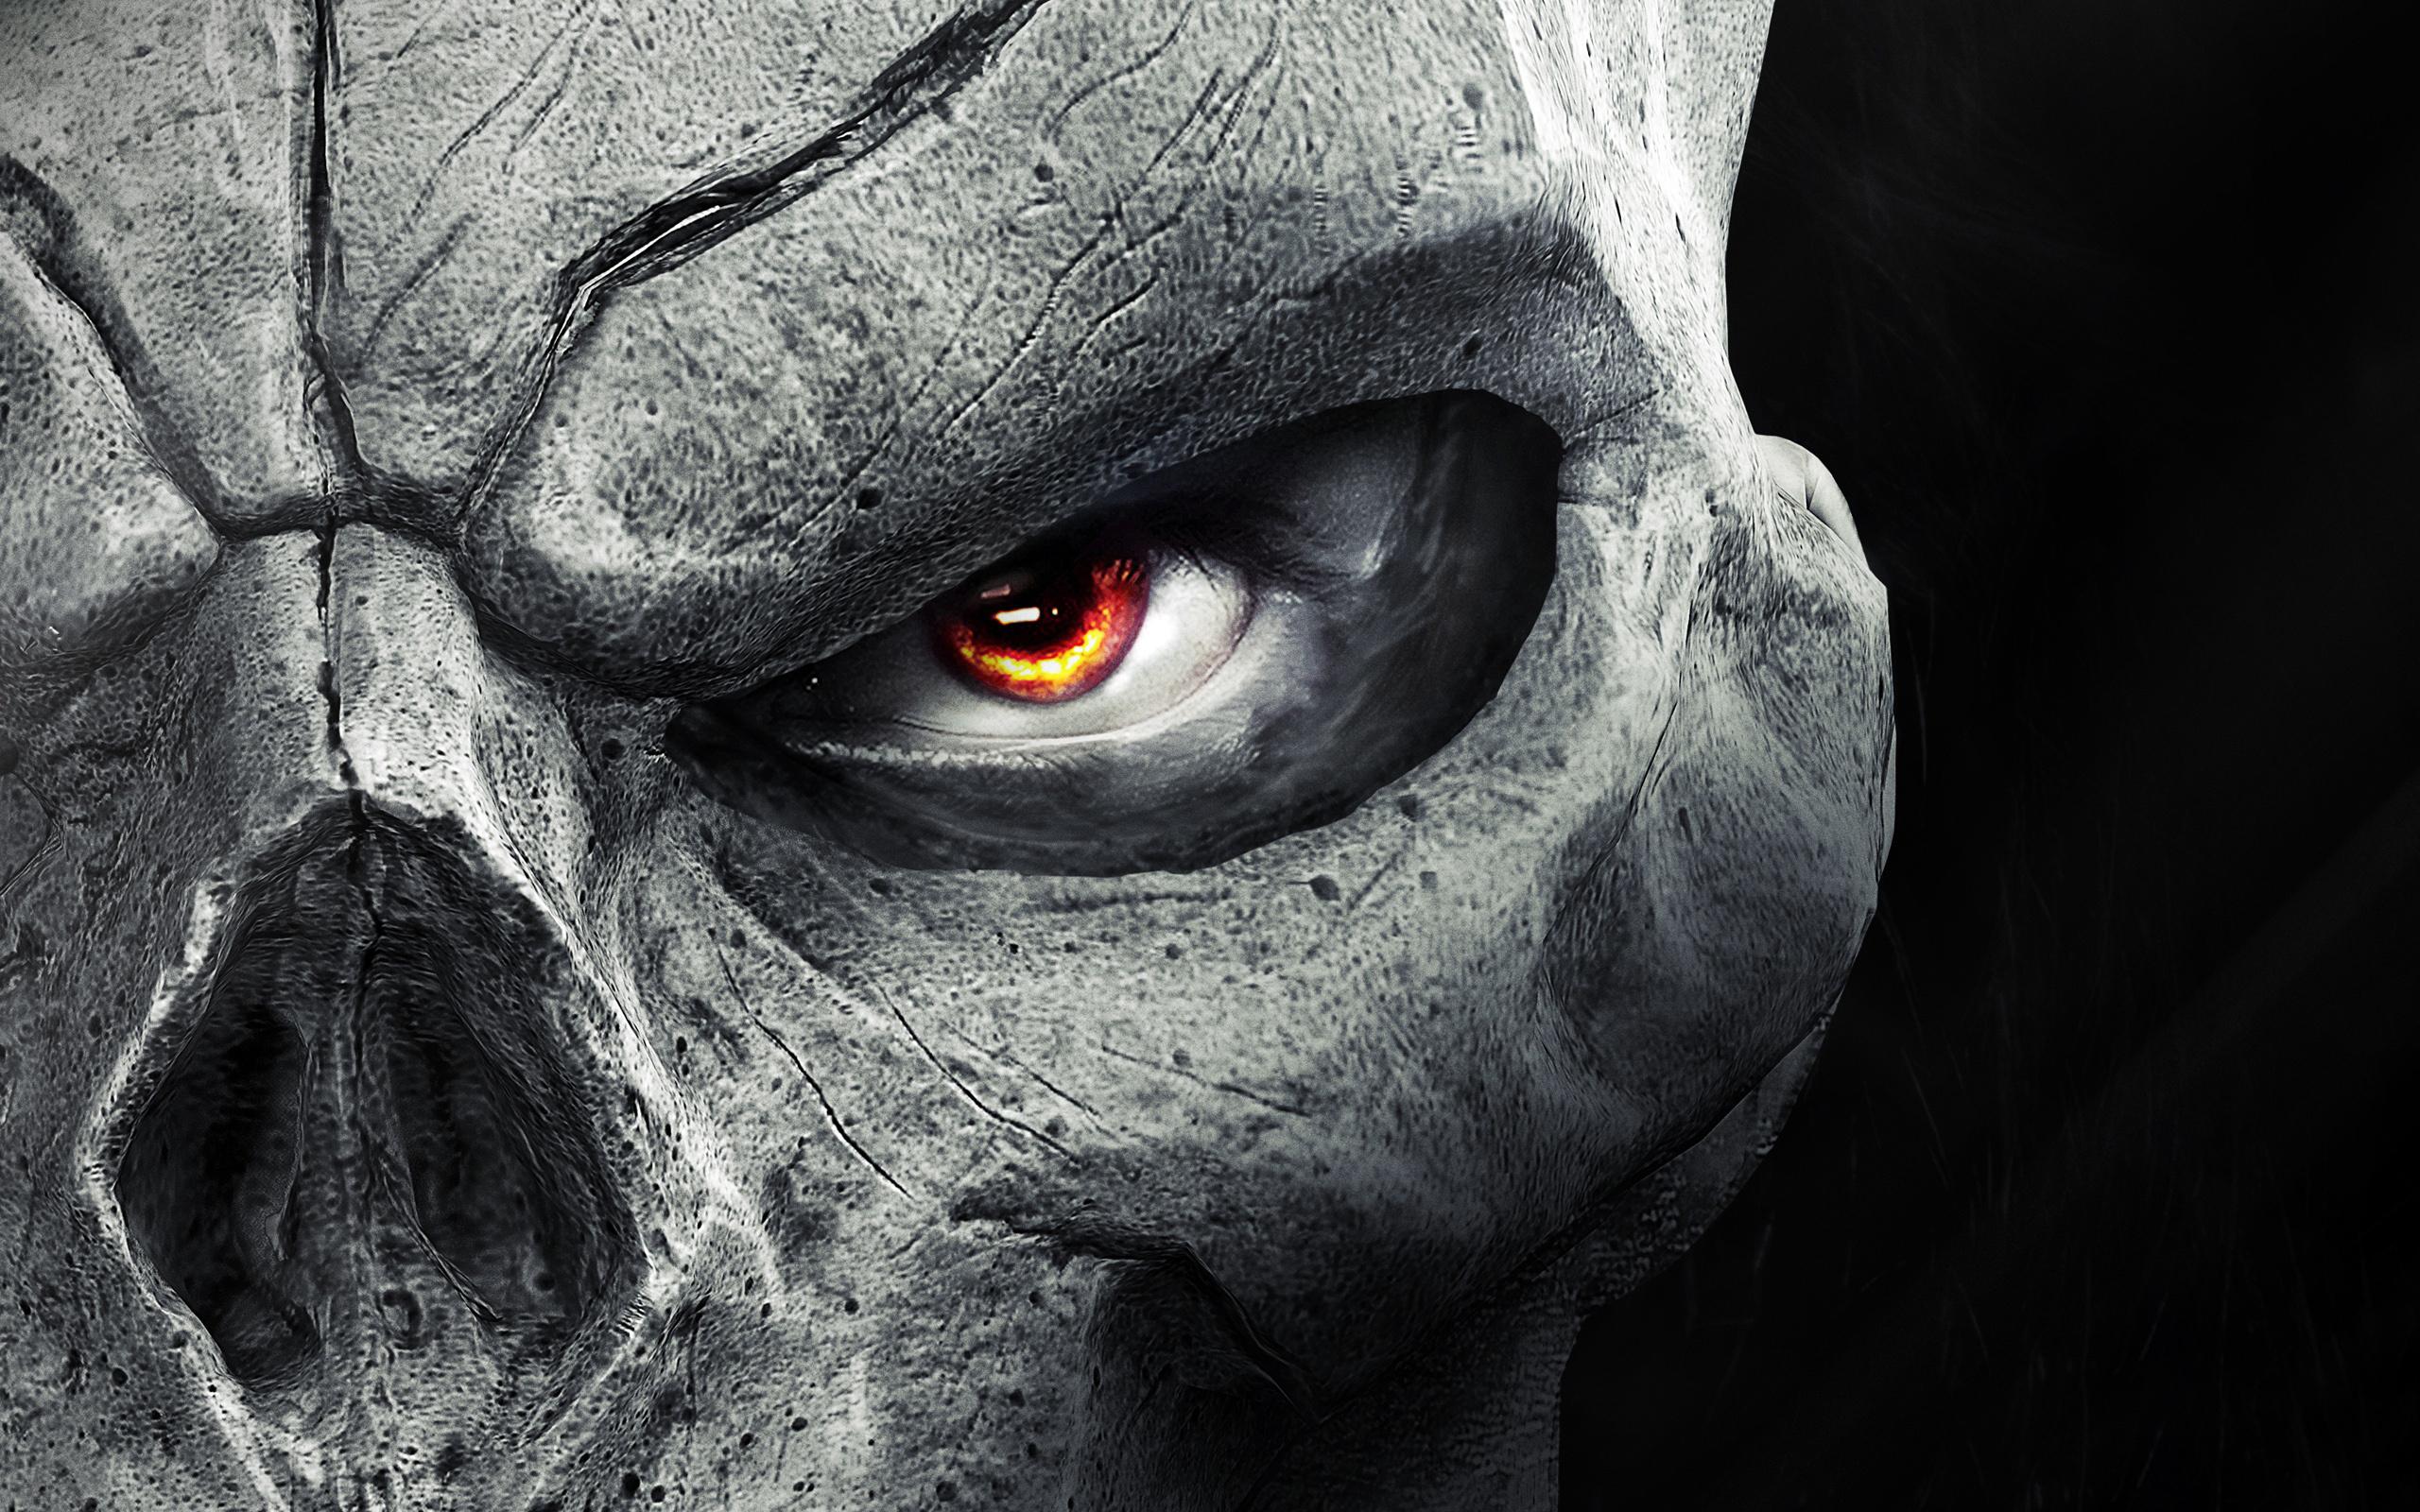 Darksiders Stone Skull HD Wallpapers 2560x1600